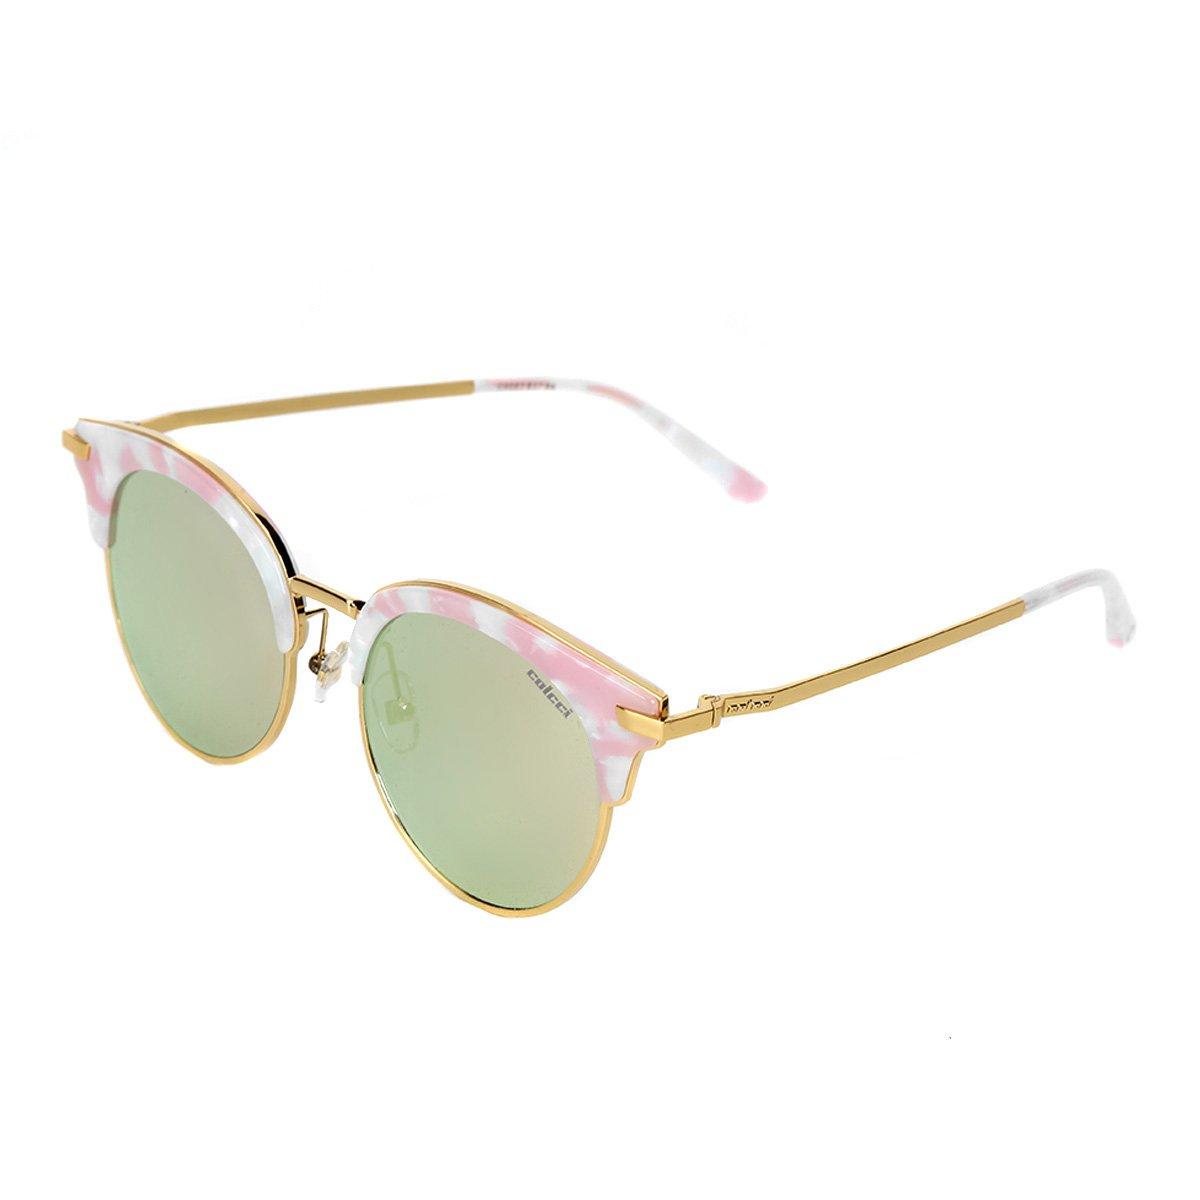 d165f8688 Óculos de Sol Colcci Gatinho Brilho Feminino - Nude   Zattini